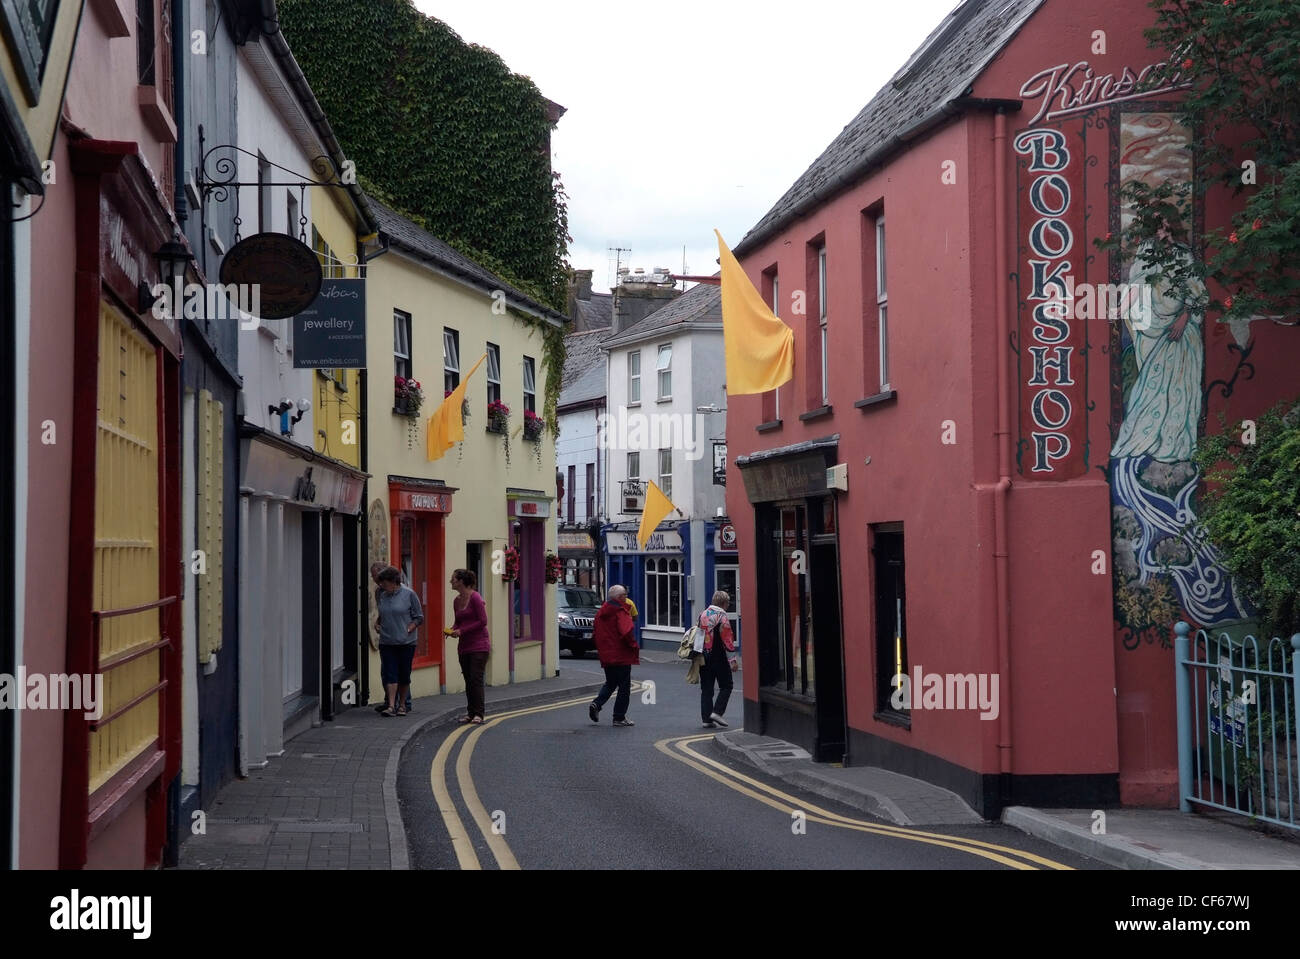 Bed And Breakfast Kinsale Cork Ireland